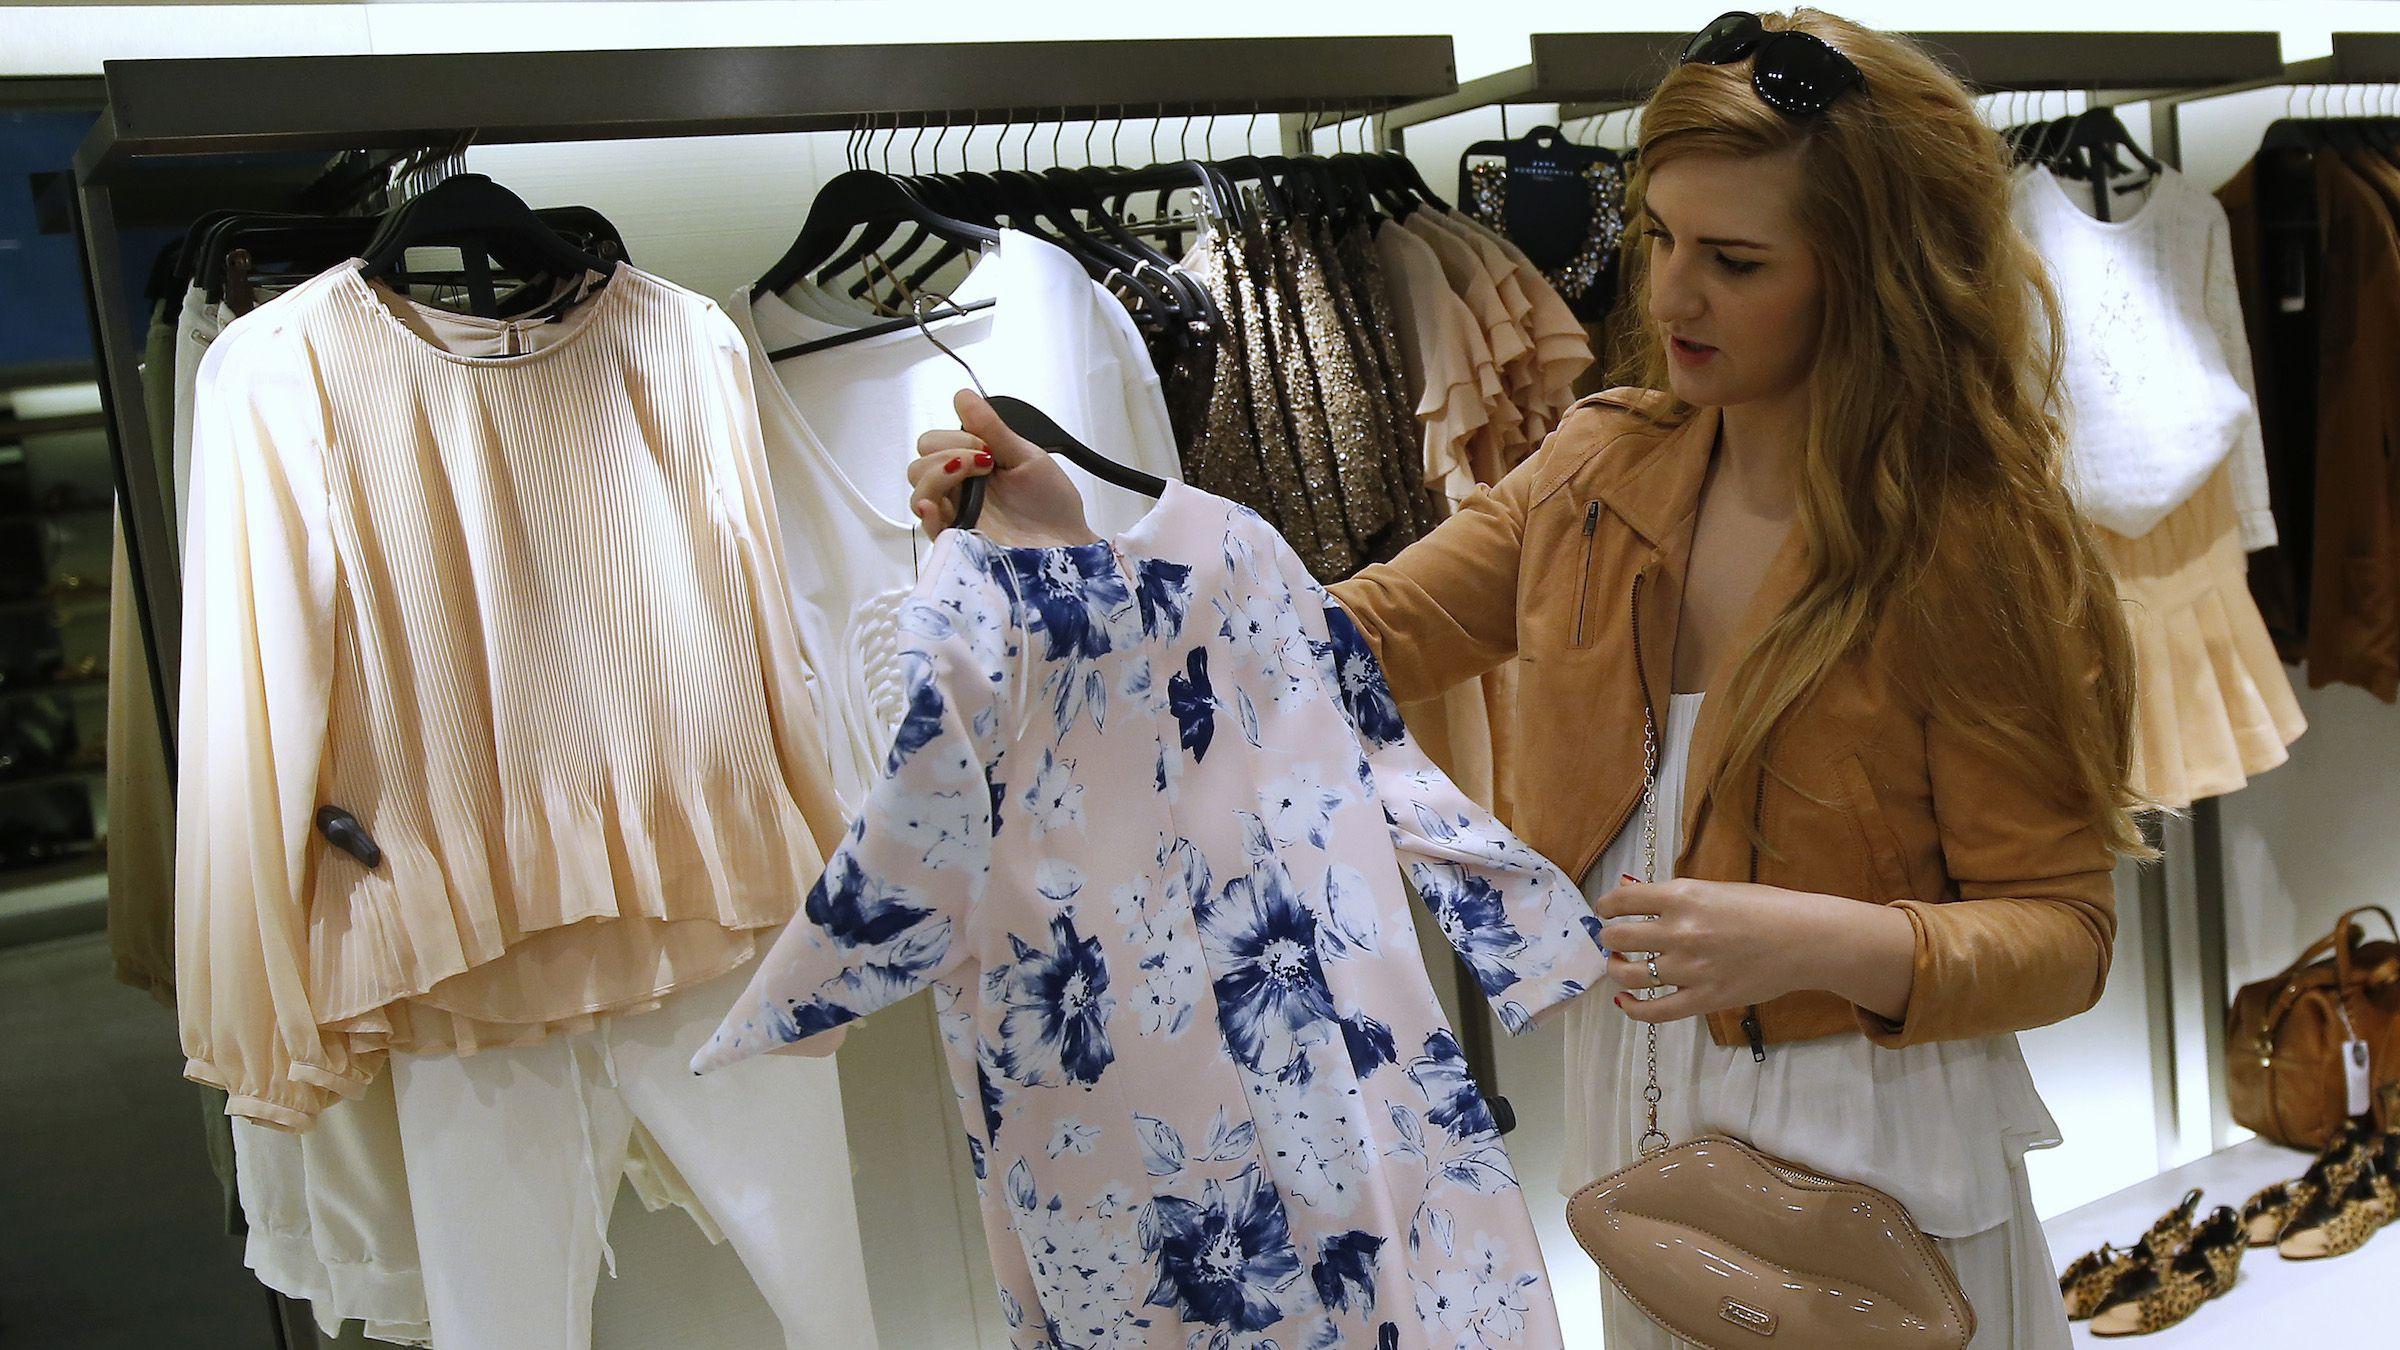 woman shopping zara store in spain